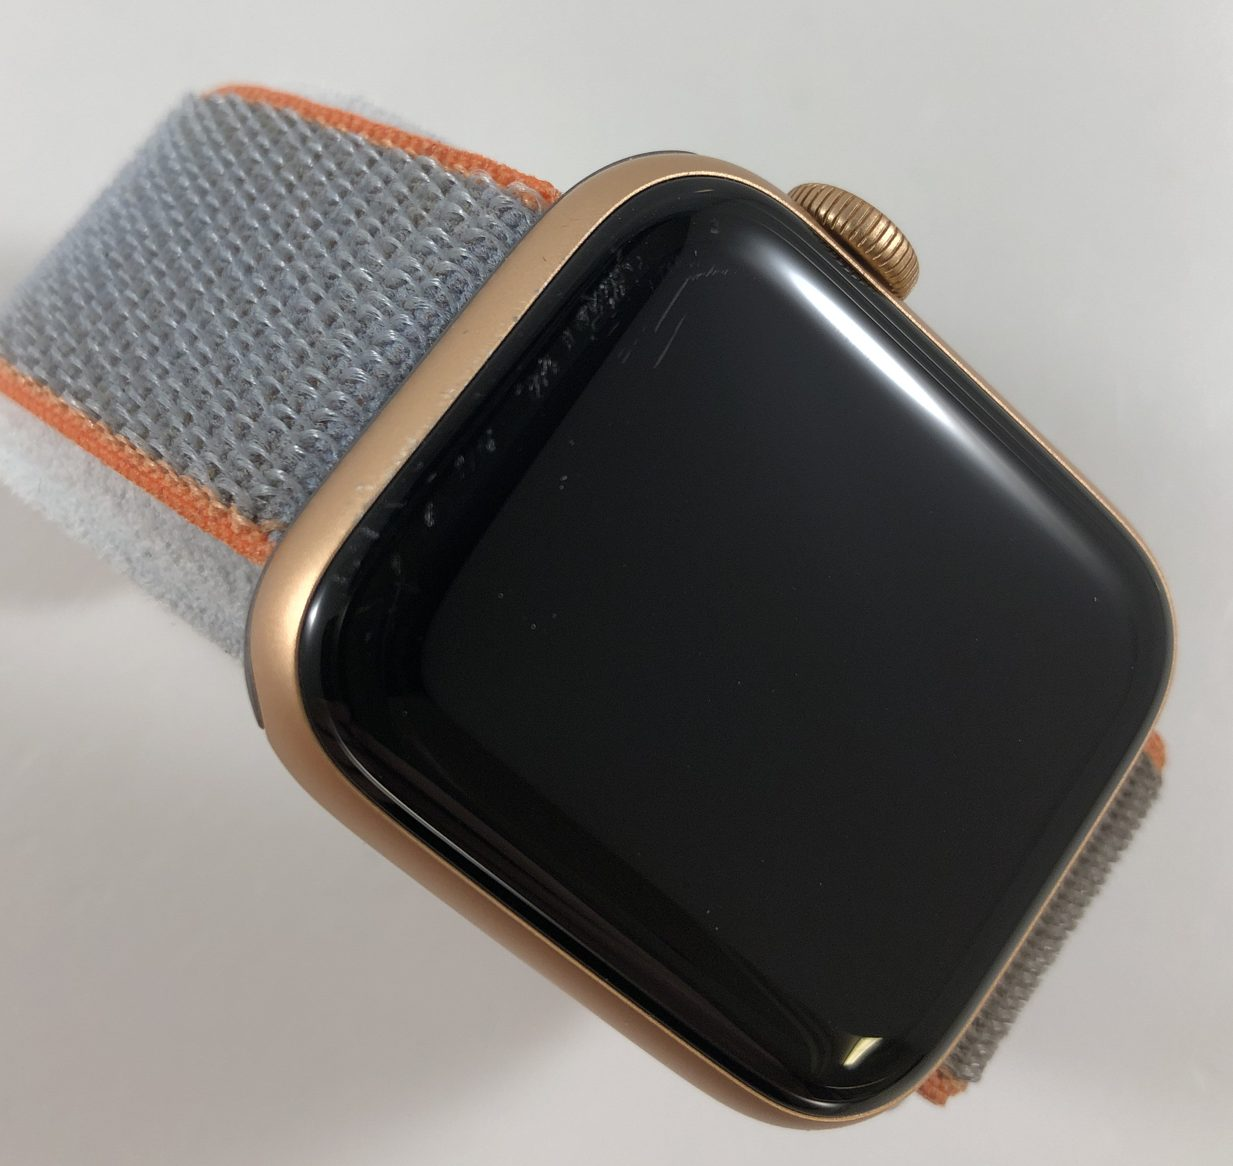 Watch Series 5 Aluminum (40mm), Gold, image 2